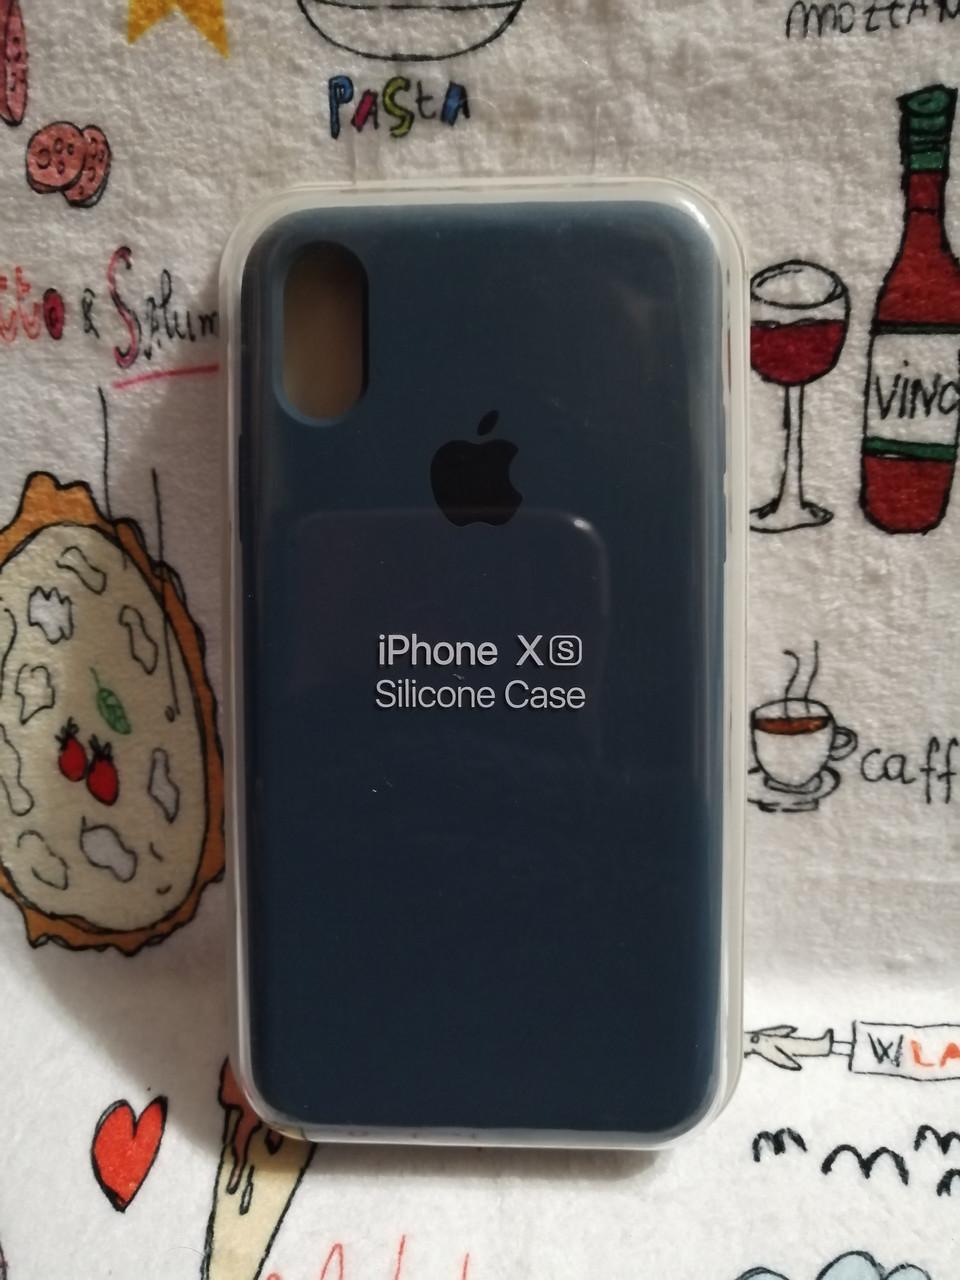 Чехол iPhone X / Xs Soft Touch Silicone Case с микрофиброй внутри (MKX32FE) - Color 28